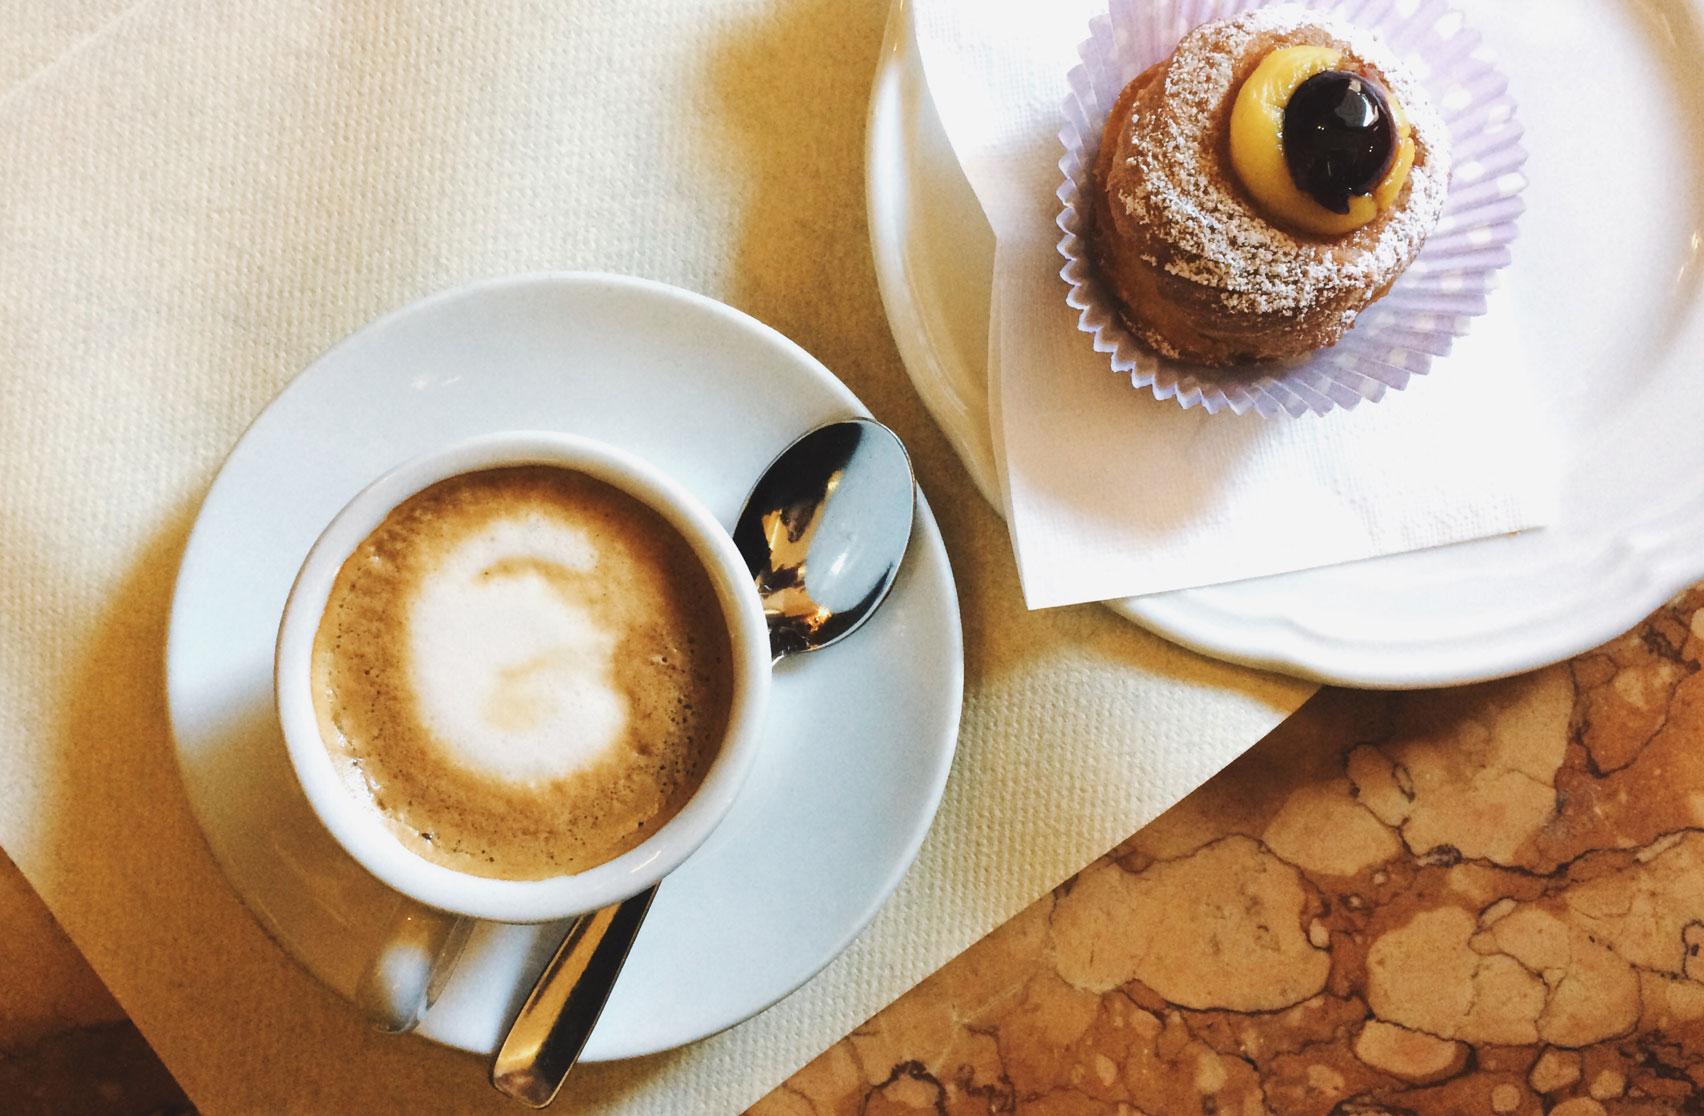 Café in Modena - Remondini